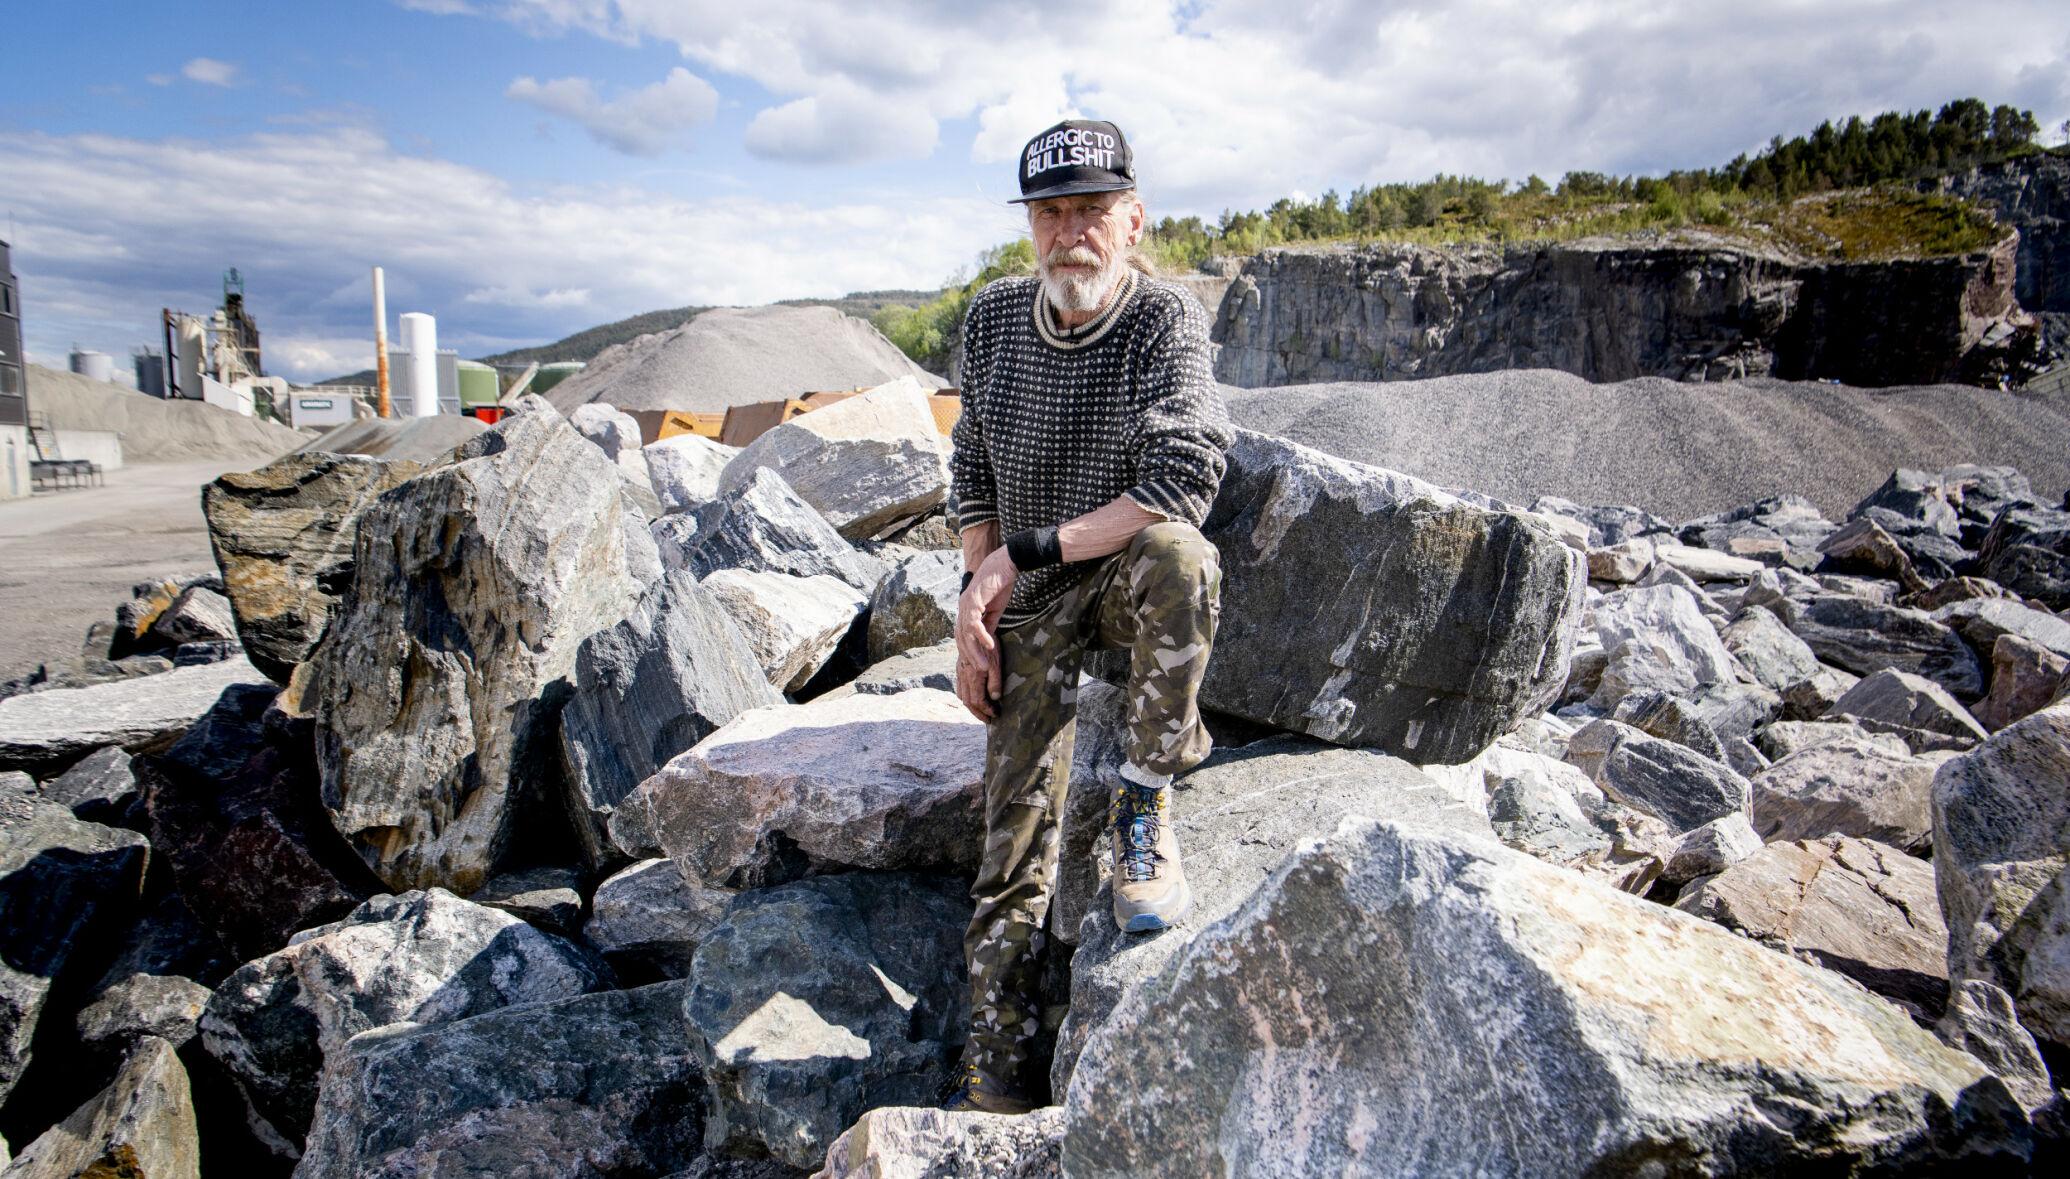 STEIN OG PENGER: Steinknusing foregår allerede i stor stil på Husøya i Kristiansund, der Elg Elgenes bor. Nå må Bolgneset få stå urørt, mener han. Foto: Lars Eivind Bones / Dagbladet